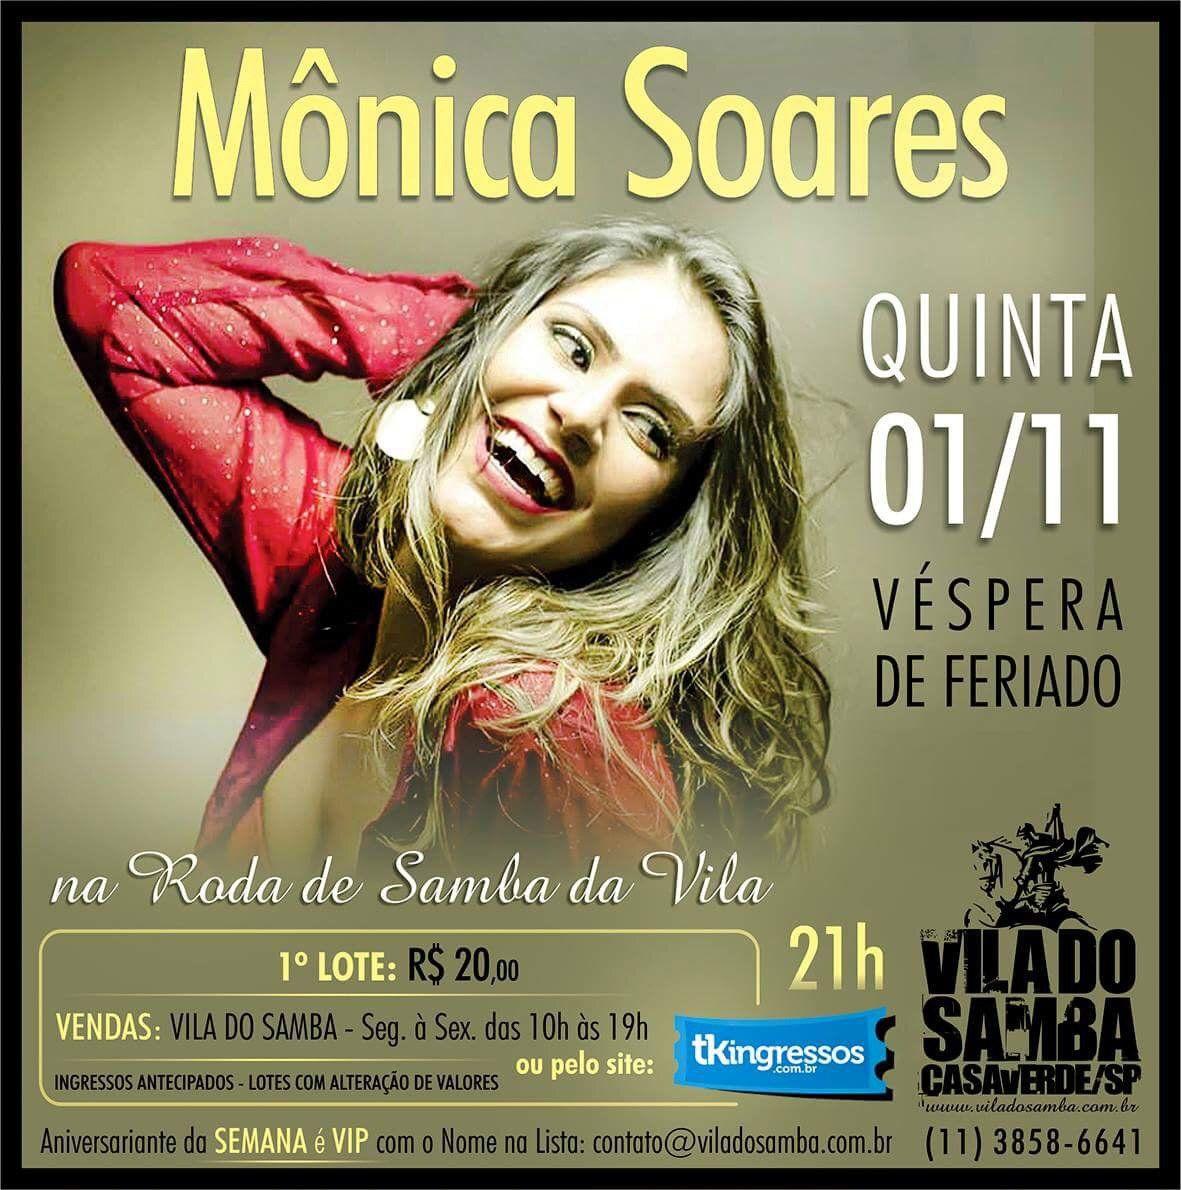 Mônica Soares - Vila do Samba - 01/11/18 - São Paulo - SP